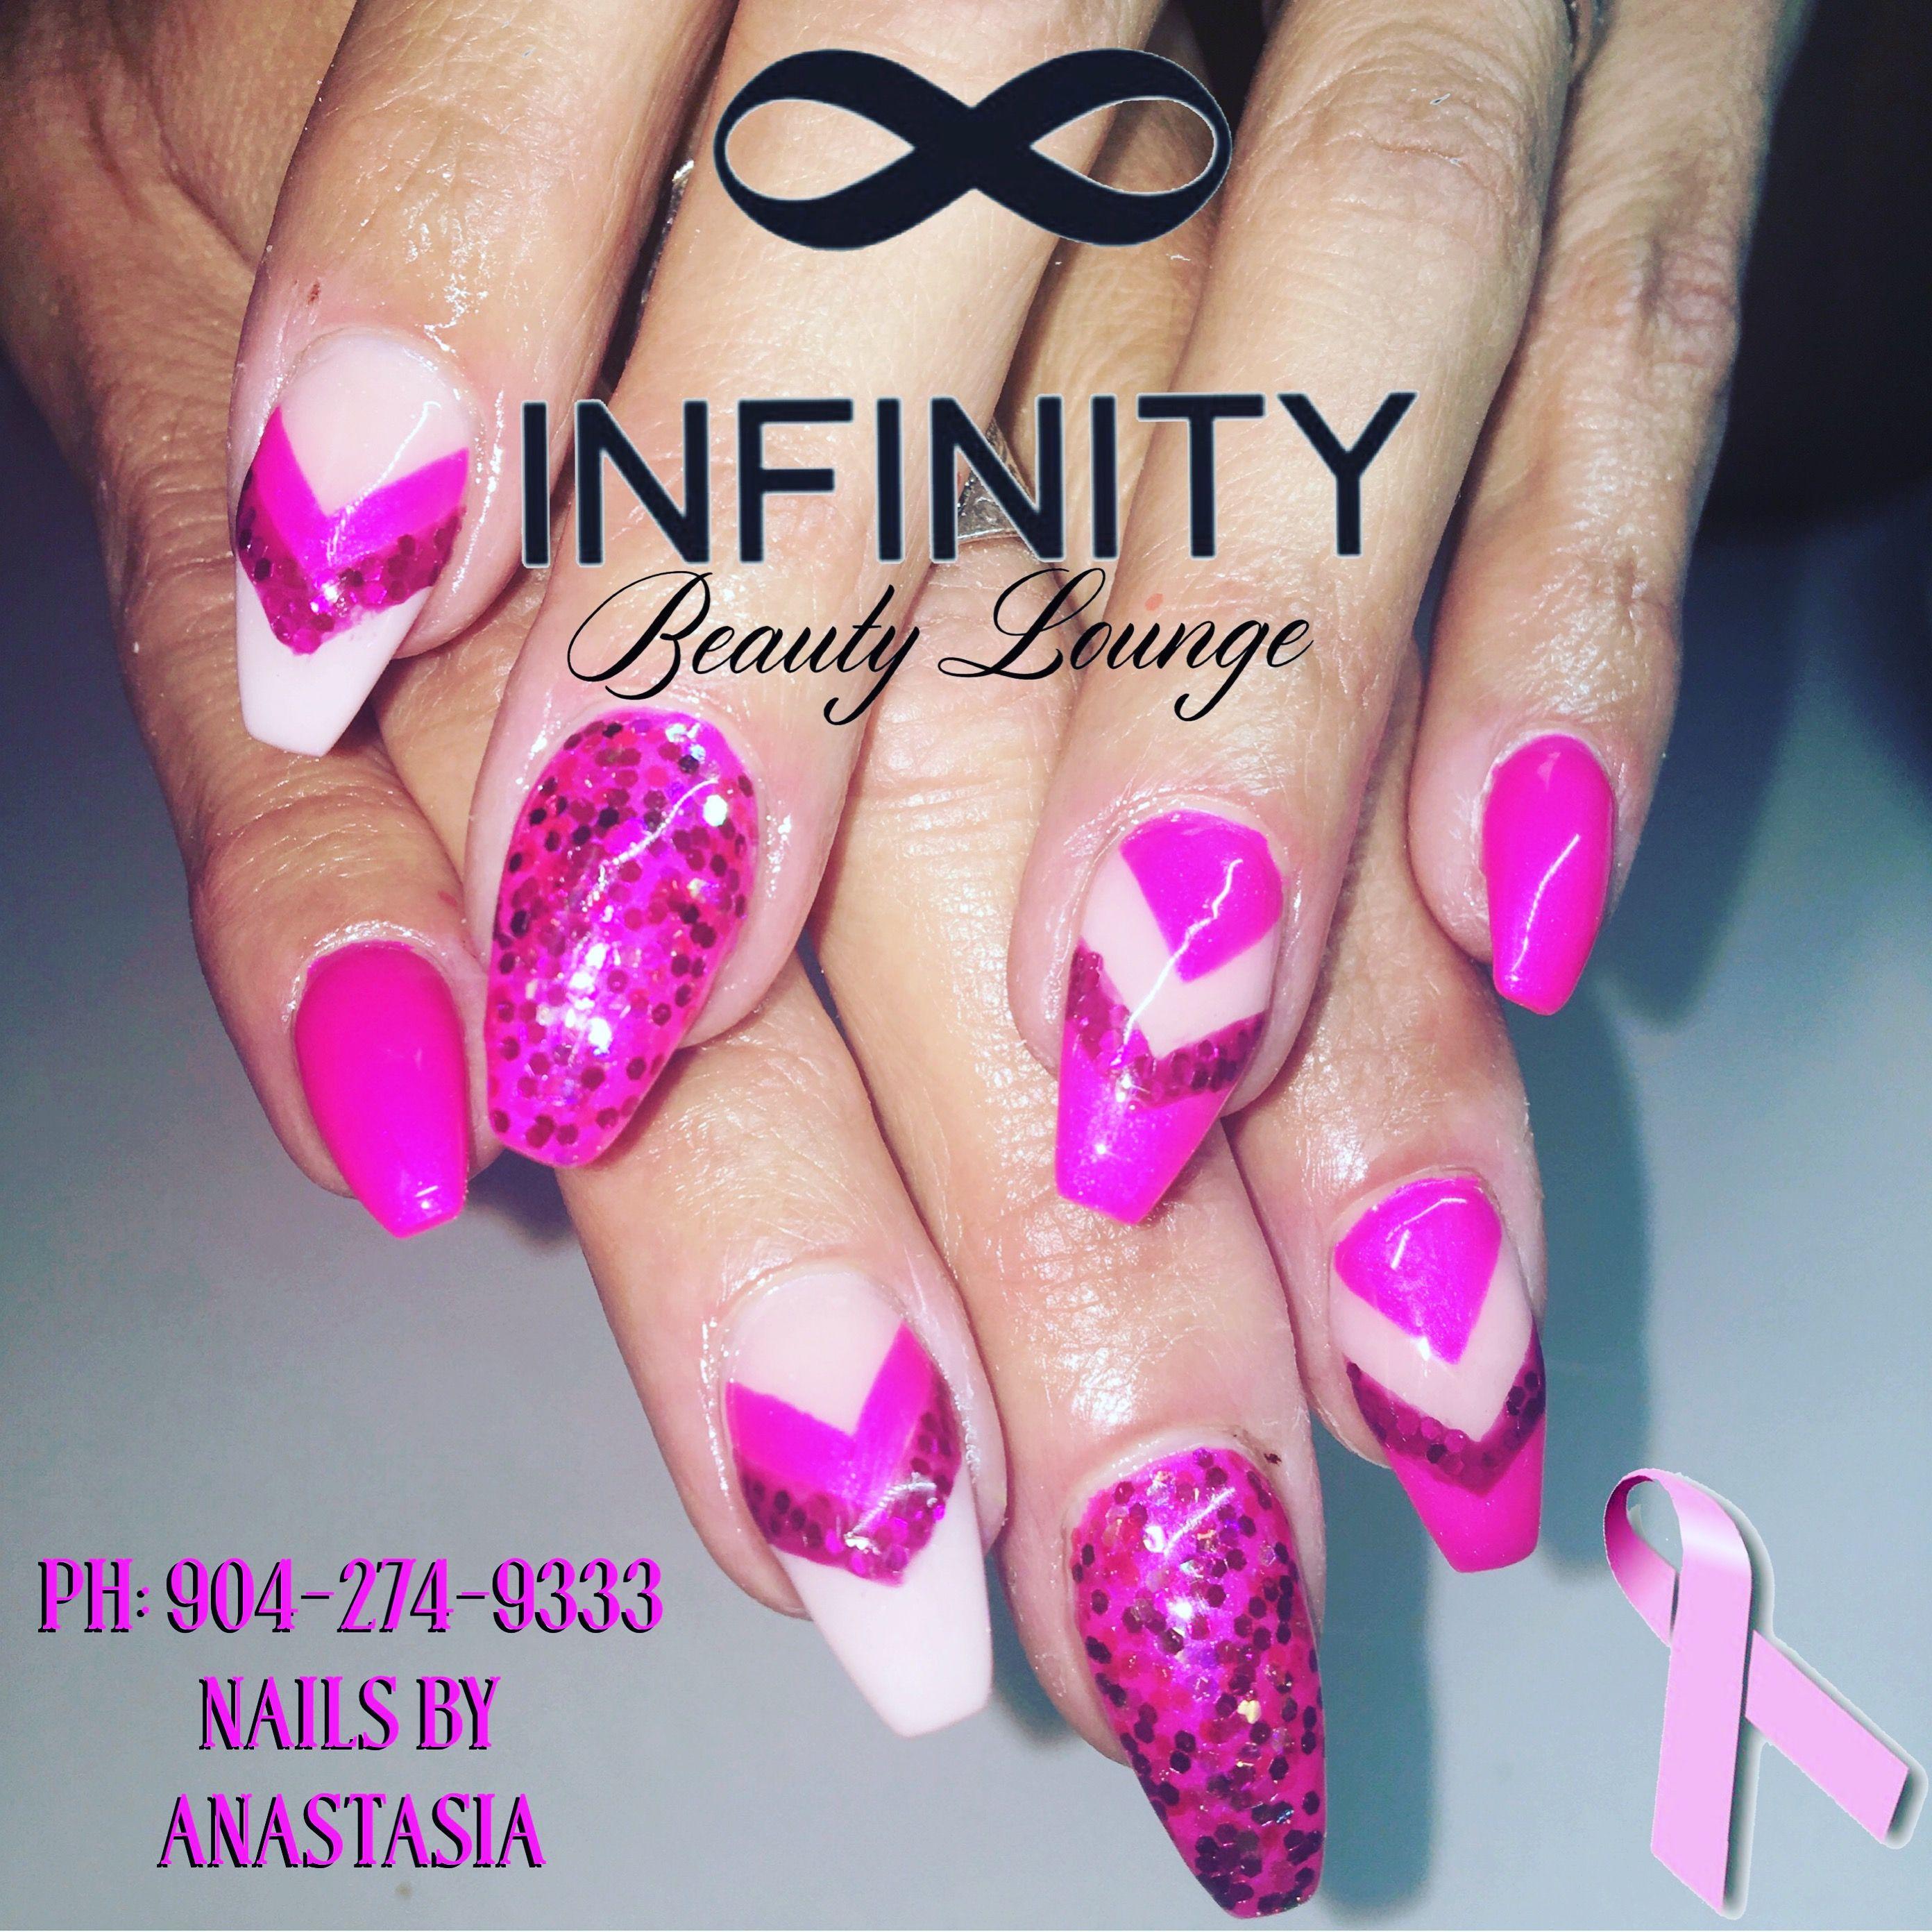 Infinity Beauty Jax 904 274 9333 Located At 3864 San Jose Park Dr Jax Fl 32217 Full Hair Nail Salon Jax J Hair And Nail Salon Graduation Nails Prom Nails